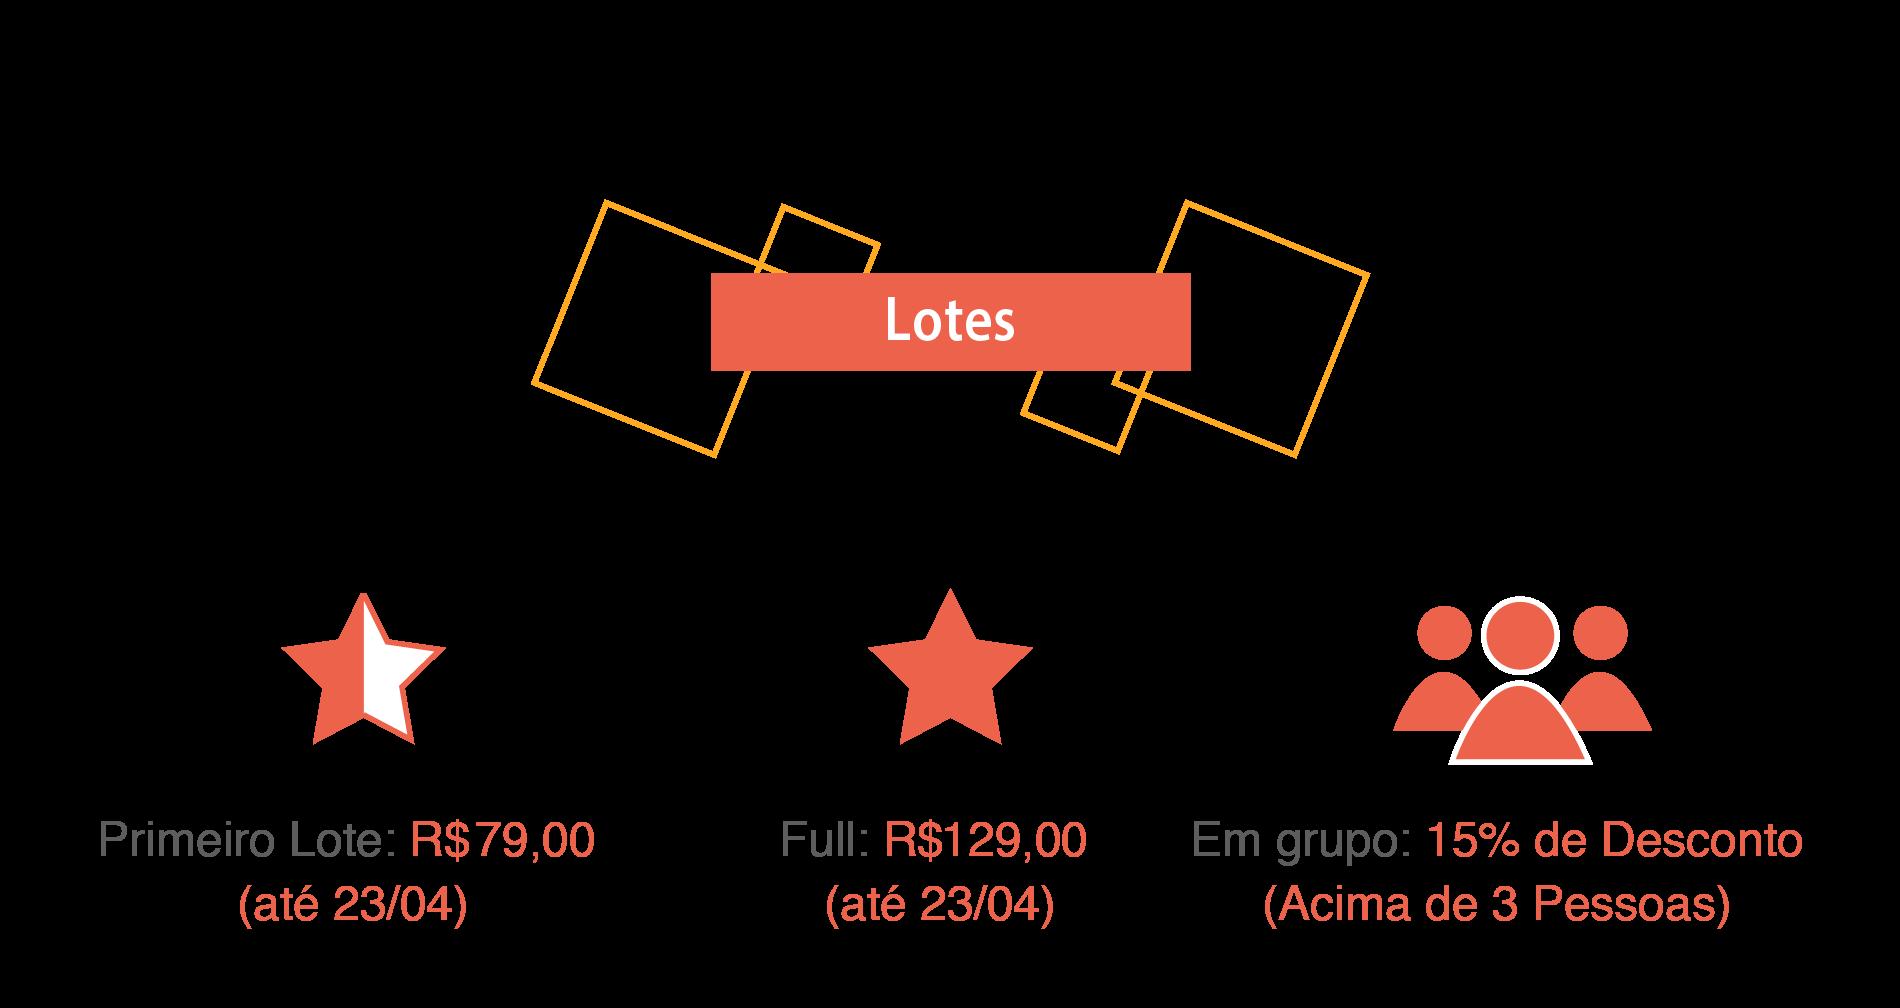 https://www.mestregp.com.br/wp-content/uploads/2018/02/Pagina-FórumRJ-lotes-1900x1008.png